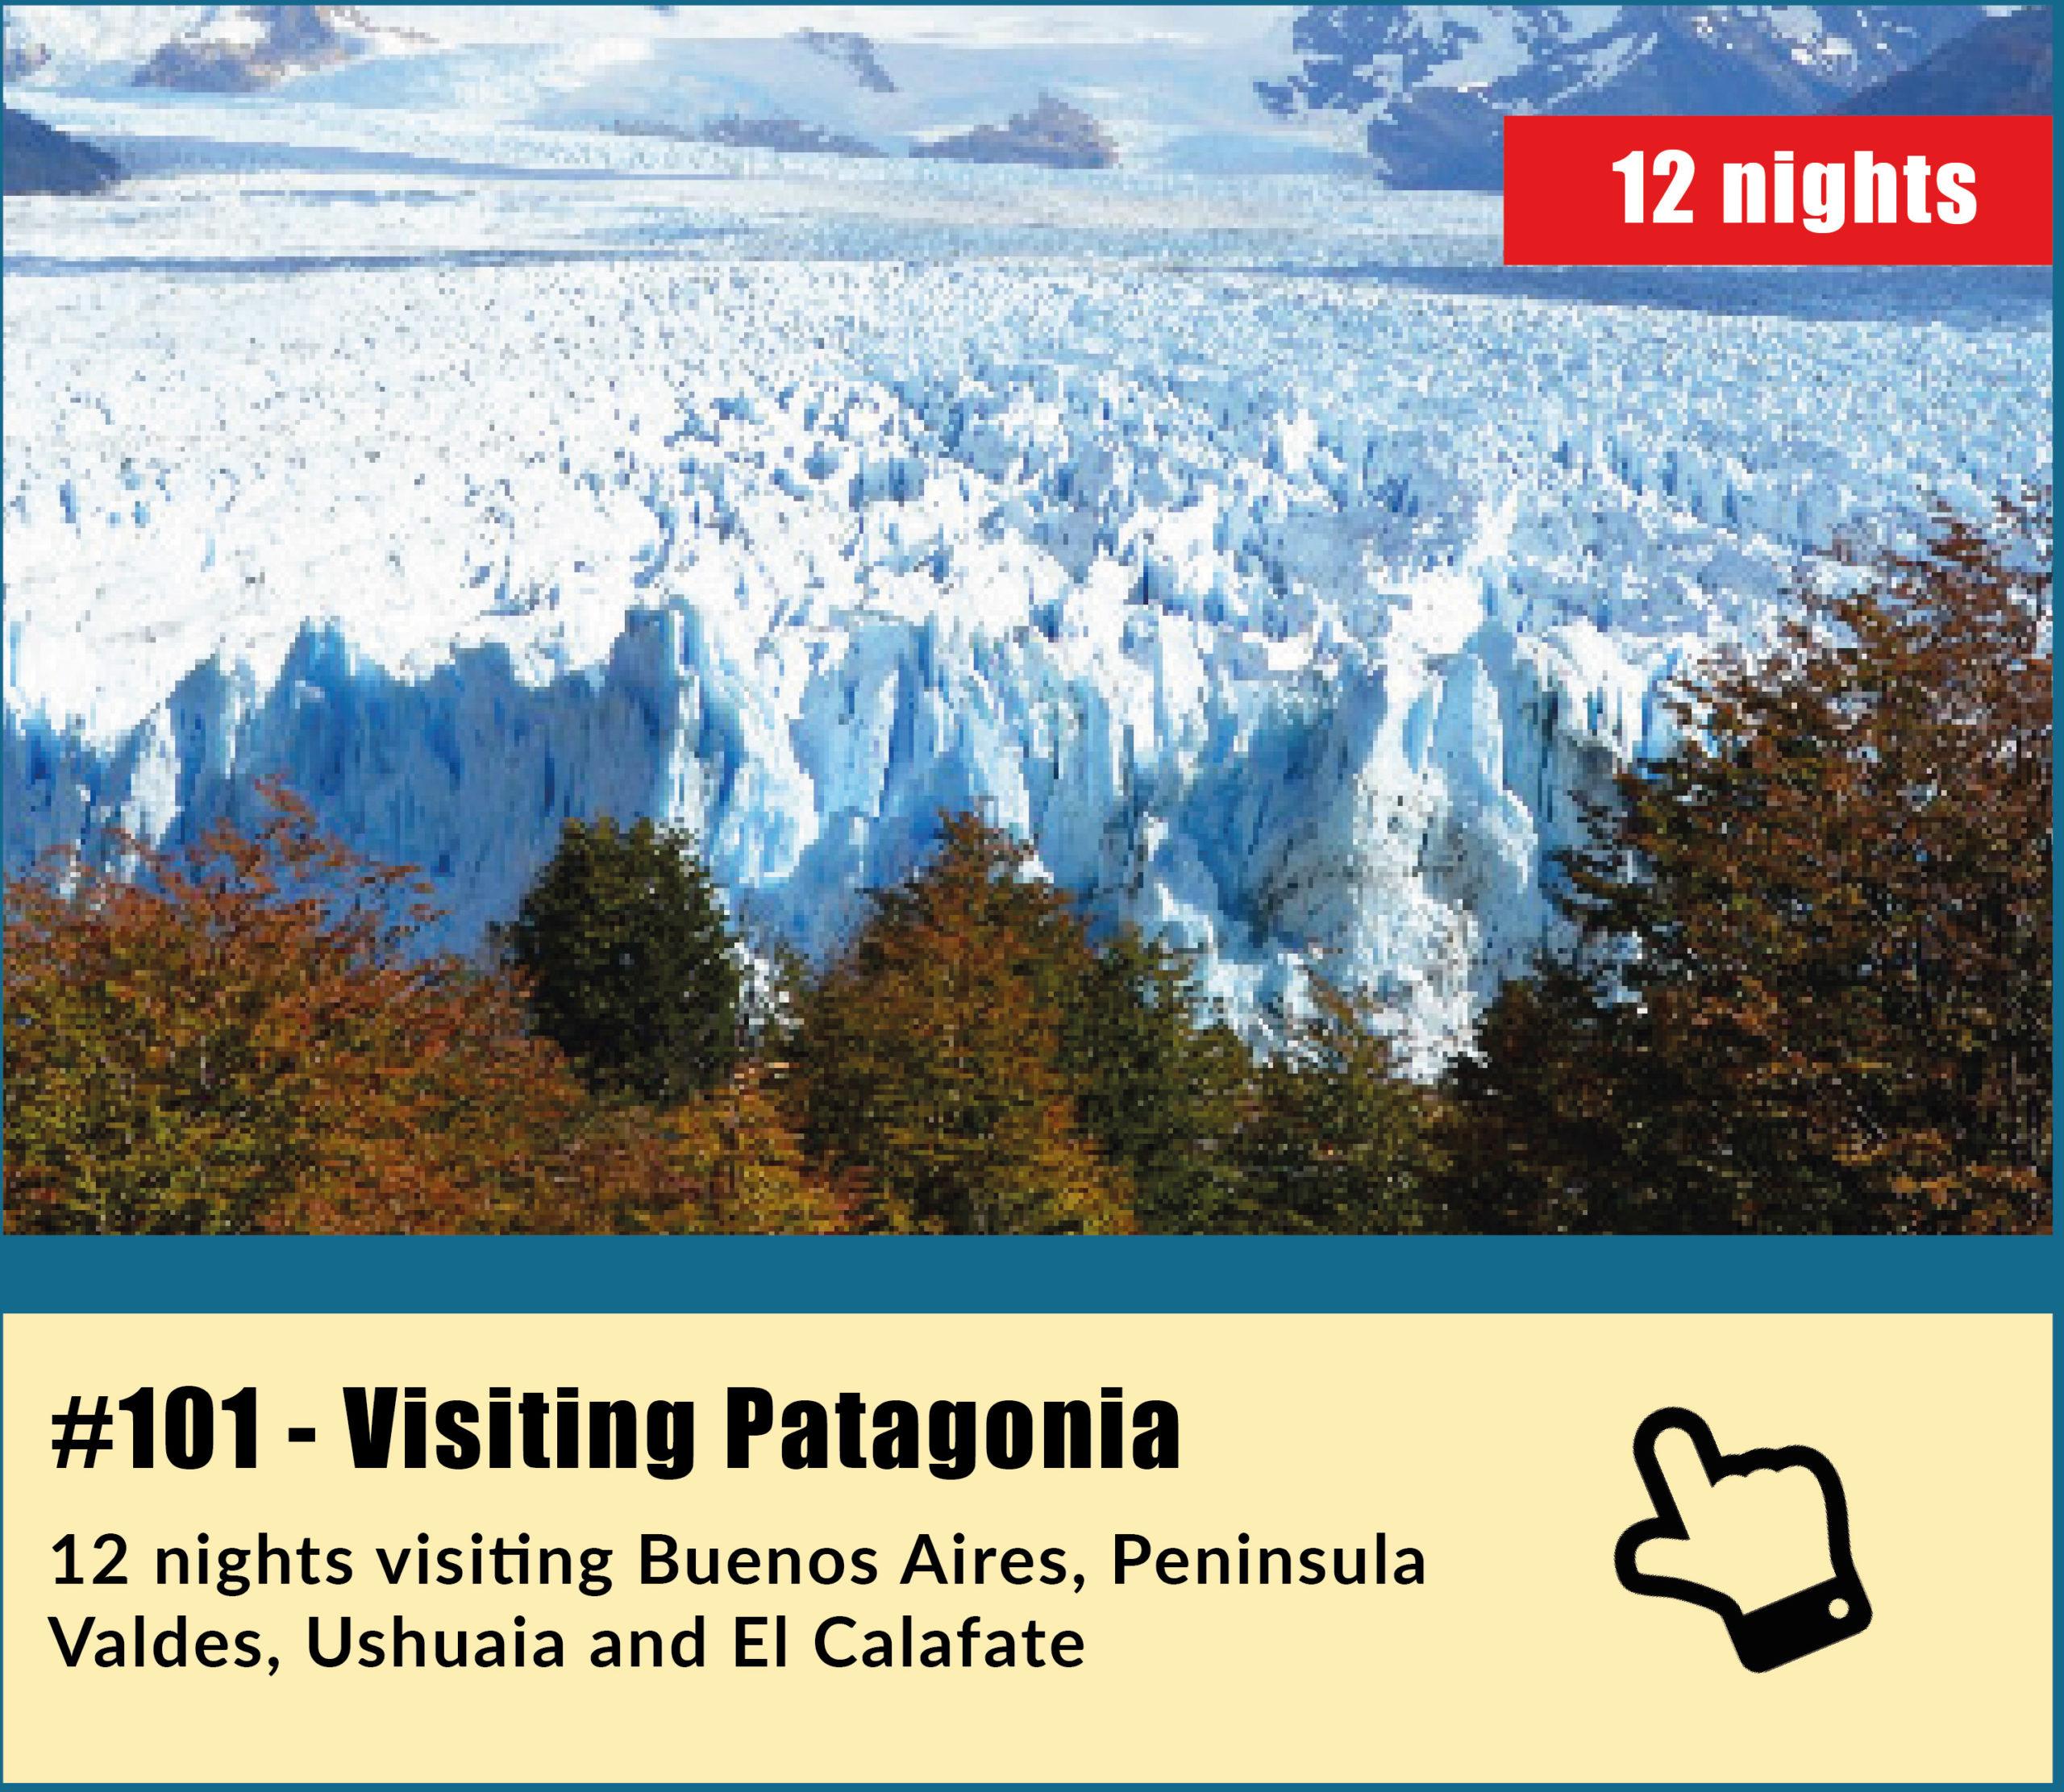 See our visiting Patagonia Tour: Buenos Aires, Peninsula Valdes, Ushuaia, El Calafate